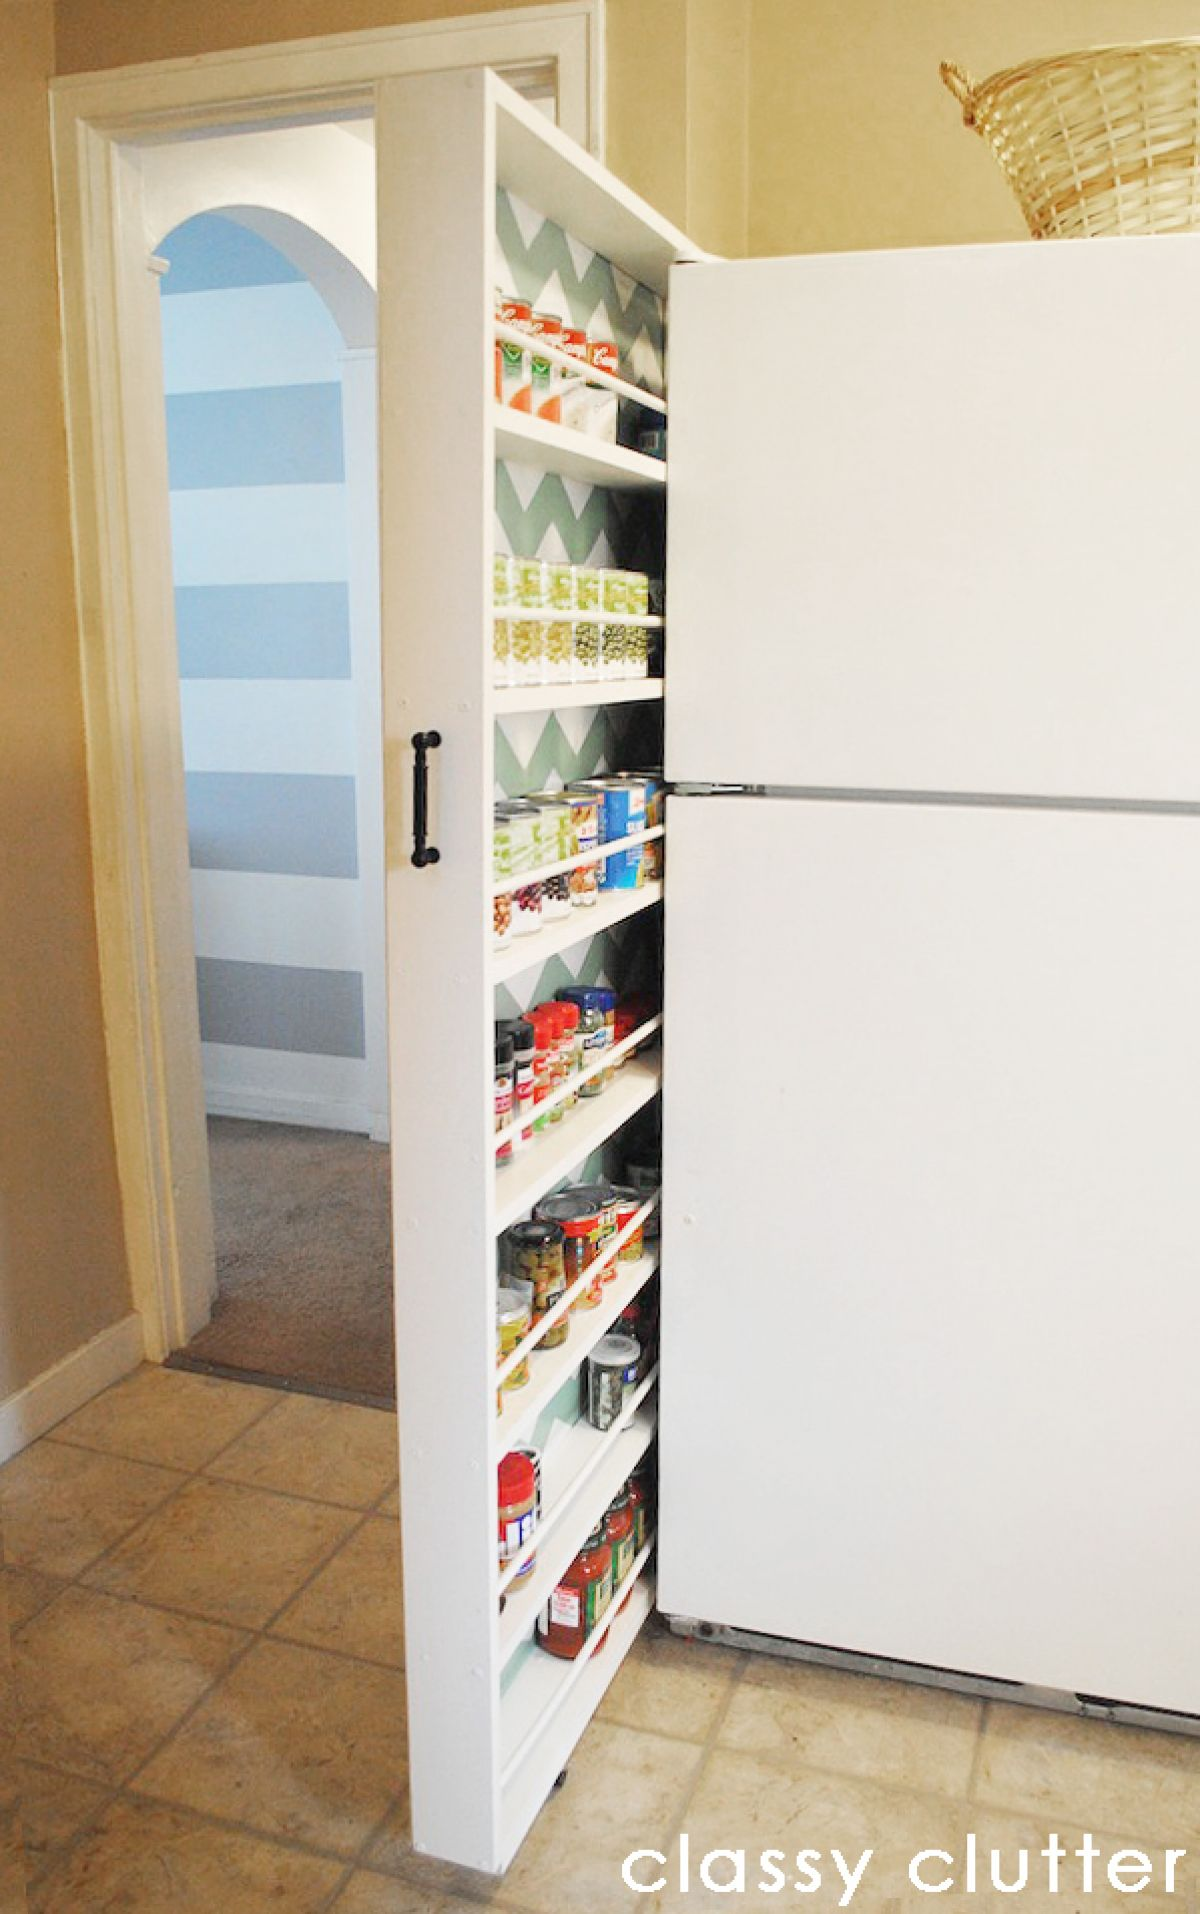 Slide-Out, Narrow Pantries are Popular Kitchen Organization Ideas